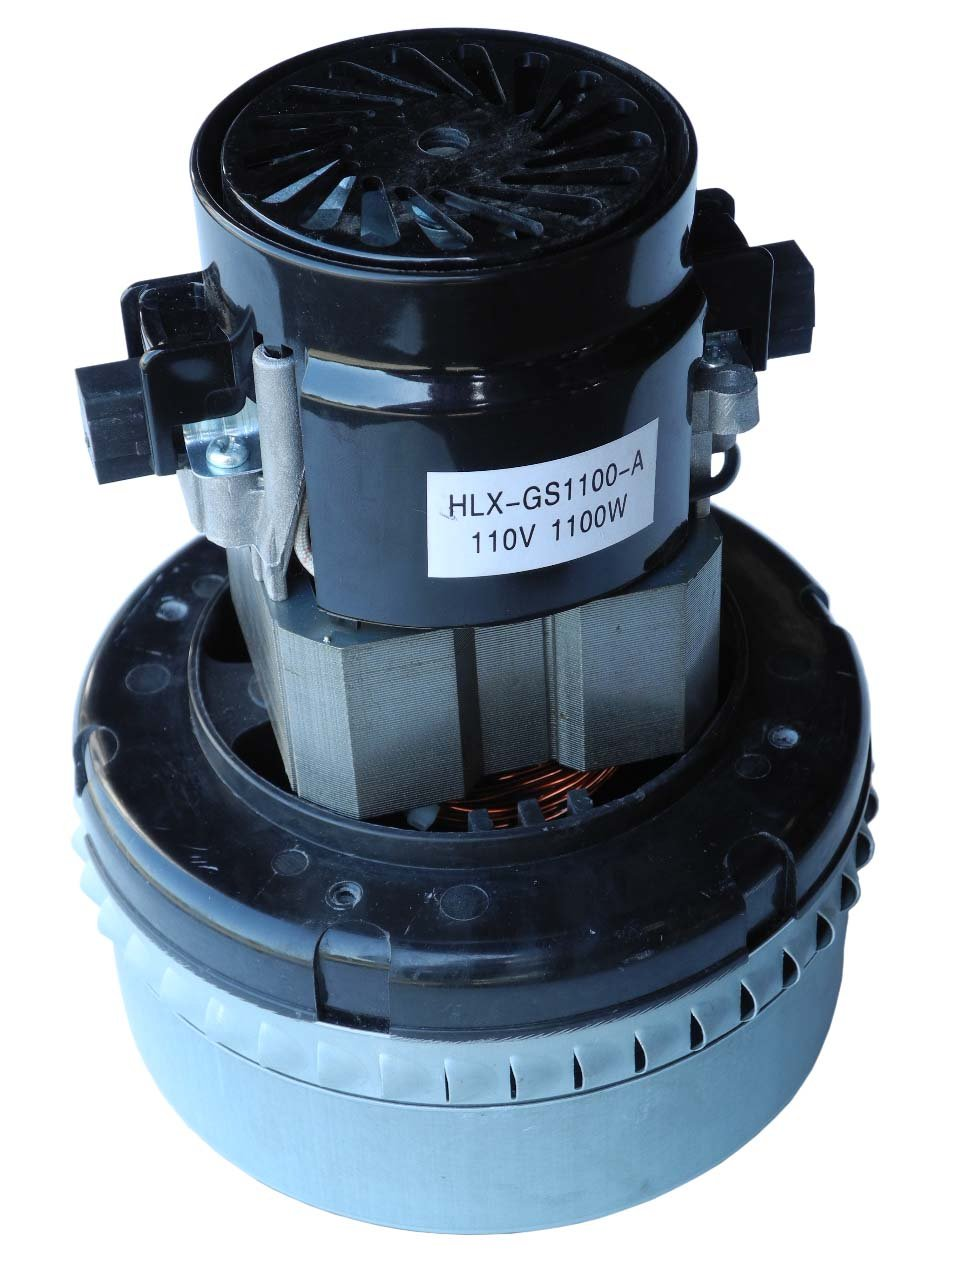 Redline Sand Media Abrasive Blast Cabinet Replacement Vacuum Motor